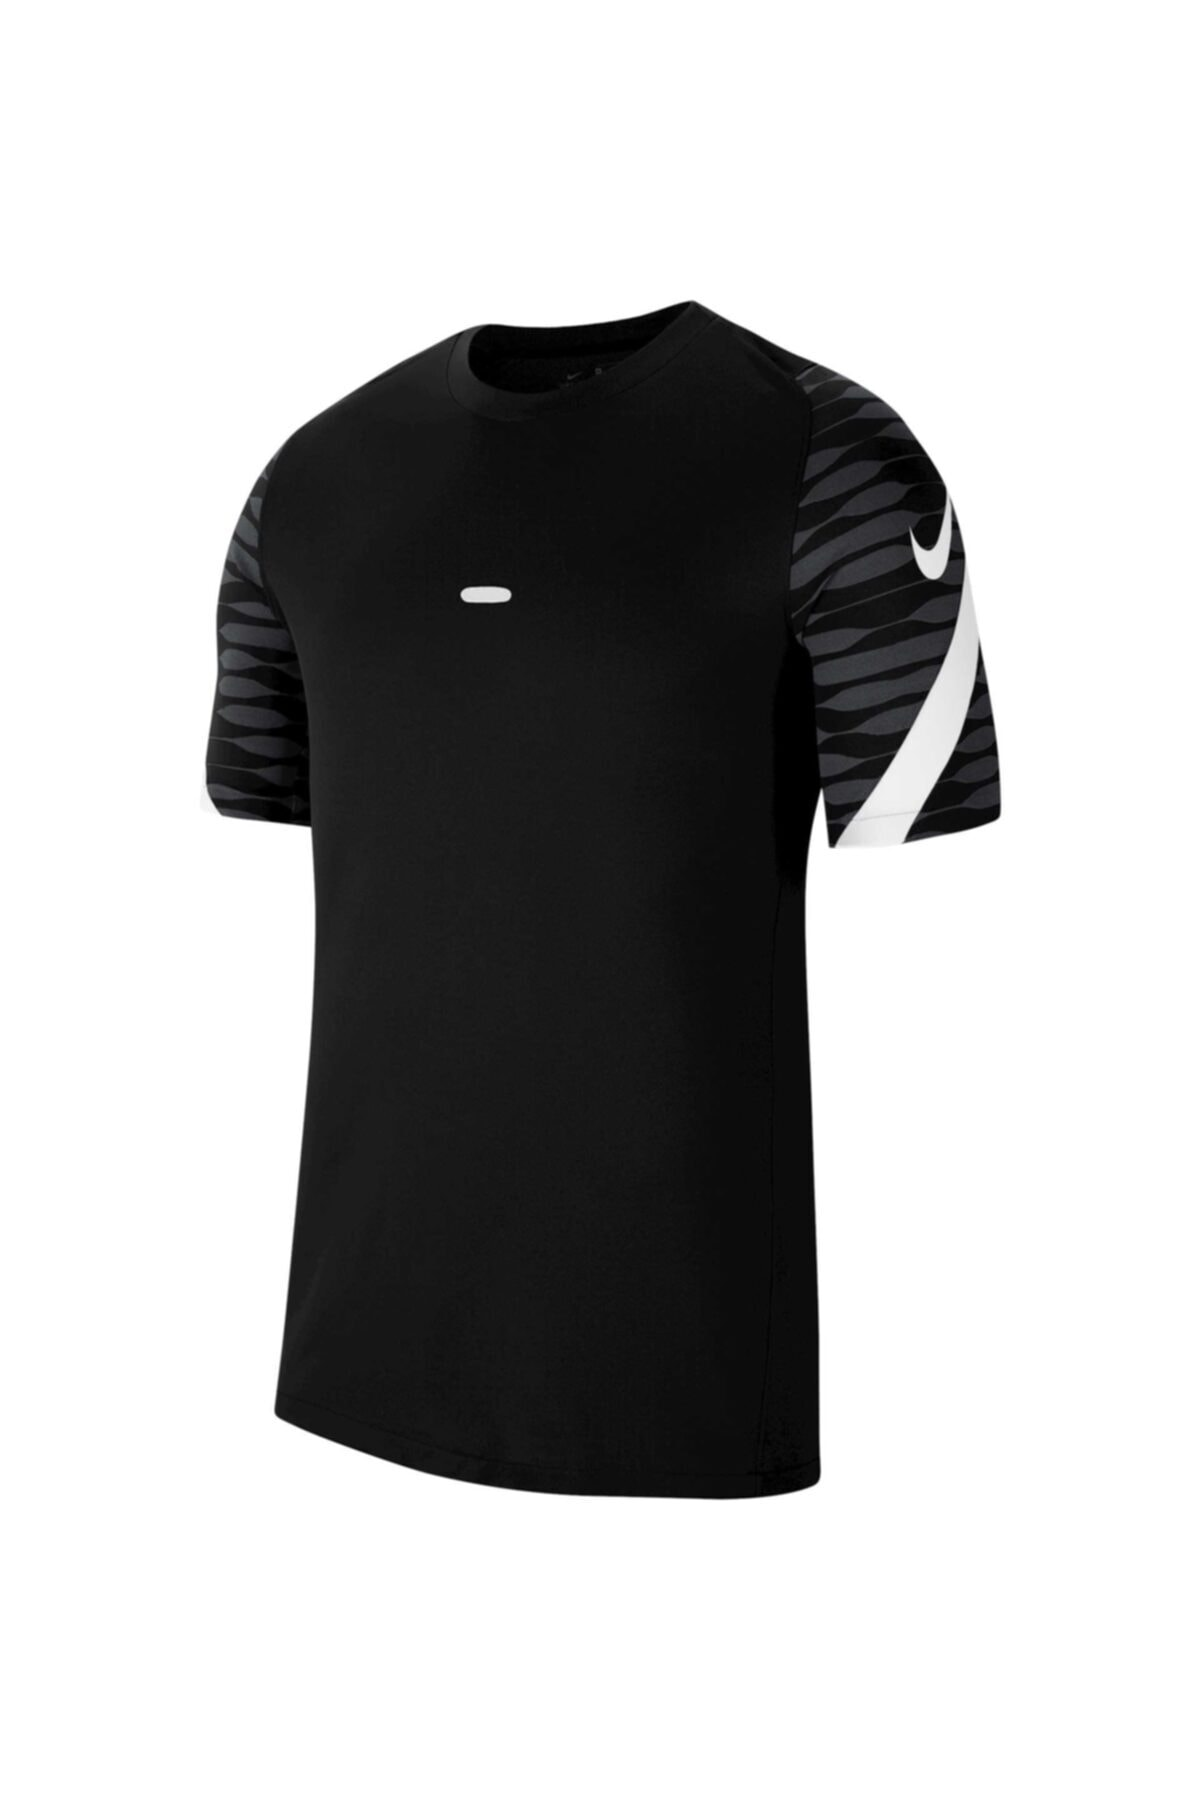 خرید انلاین تیشرت ورزشی زنانه ترکیه برند Nike اورجینال رنگ مشکی کد ty95885378